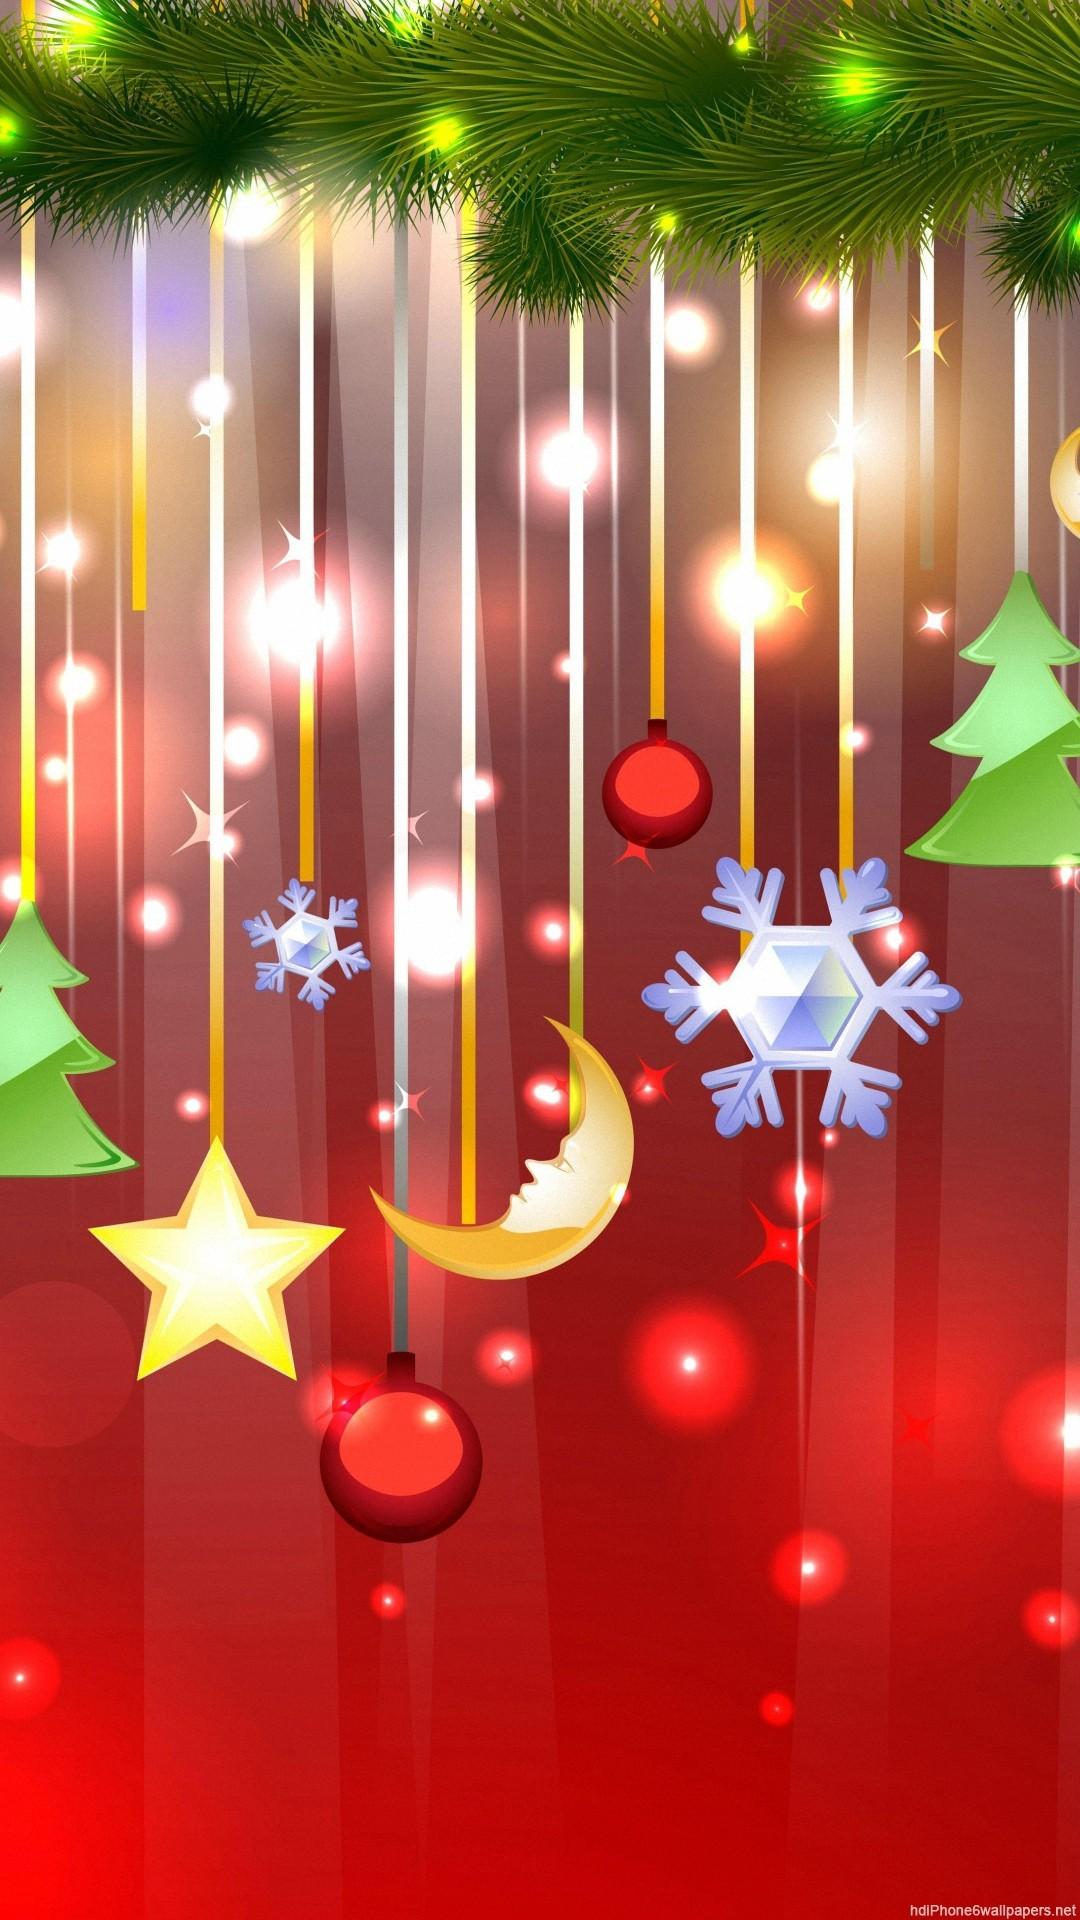 Girly christmas wallpapers 60 images - Hd christmas wallpapers 1080p ...